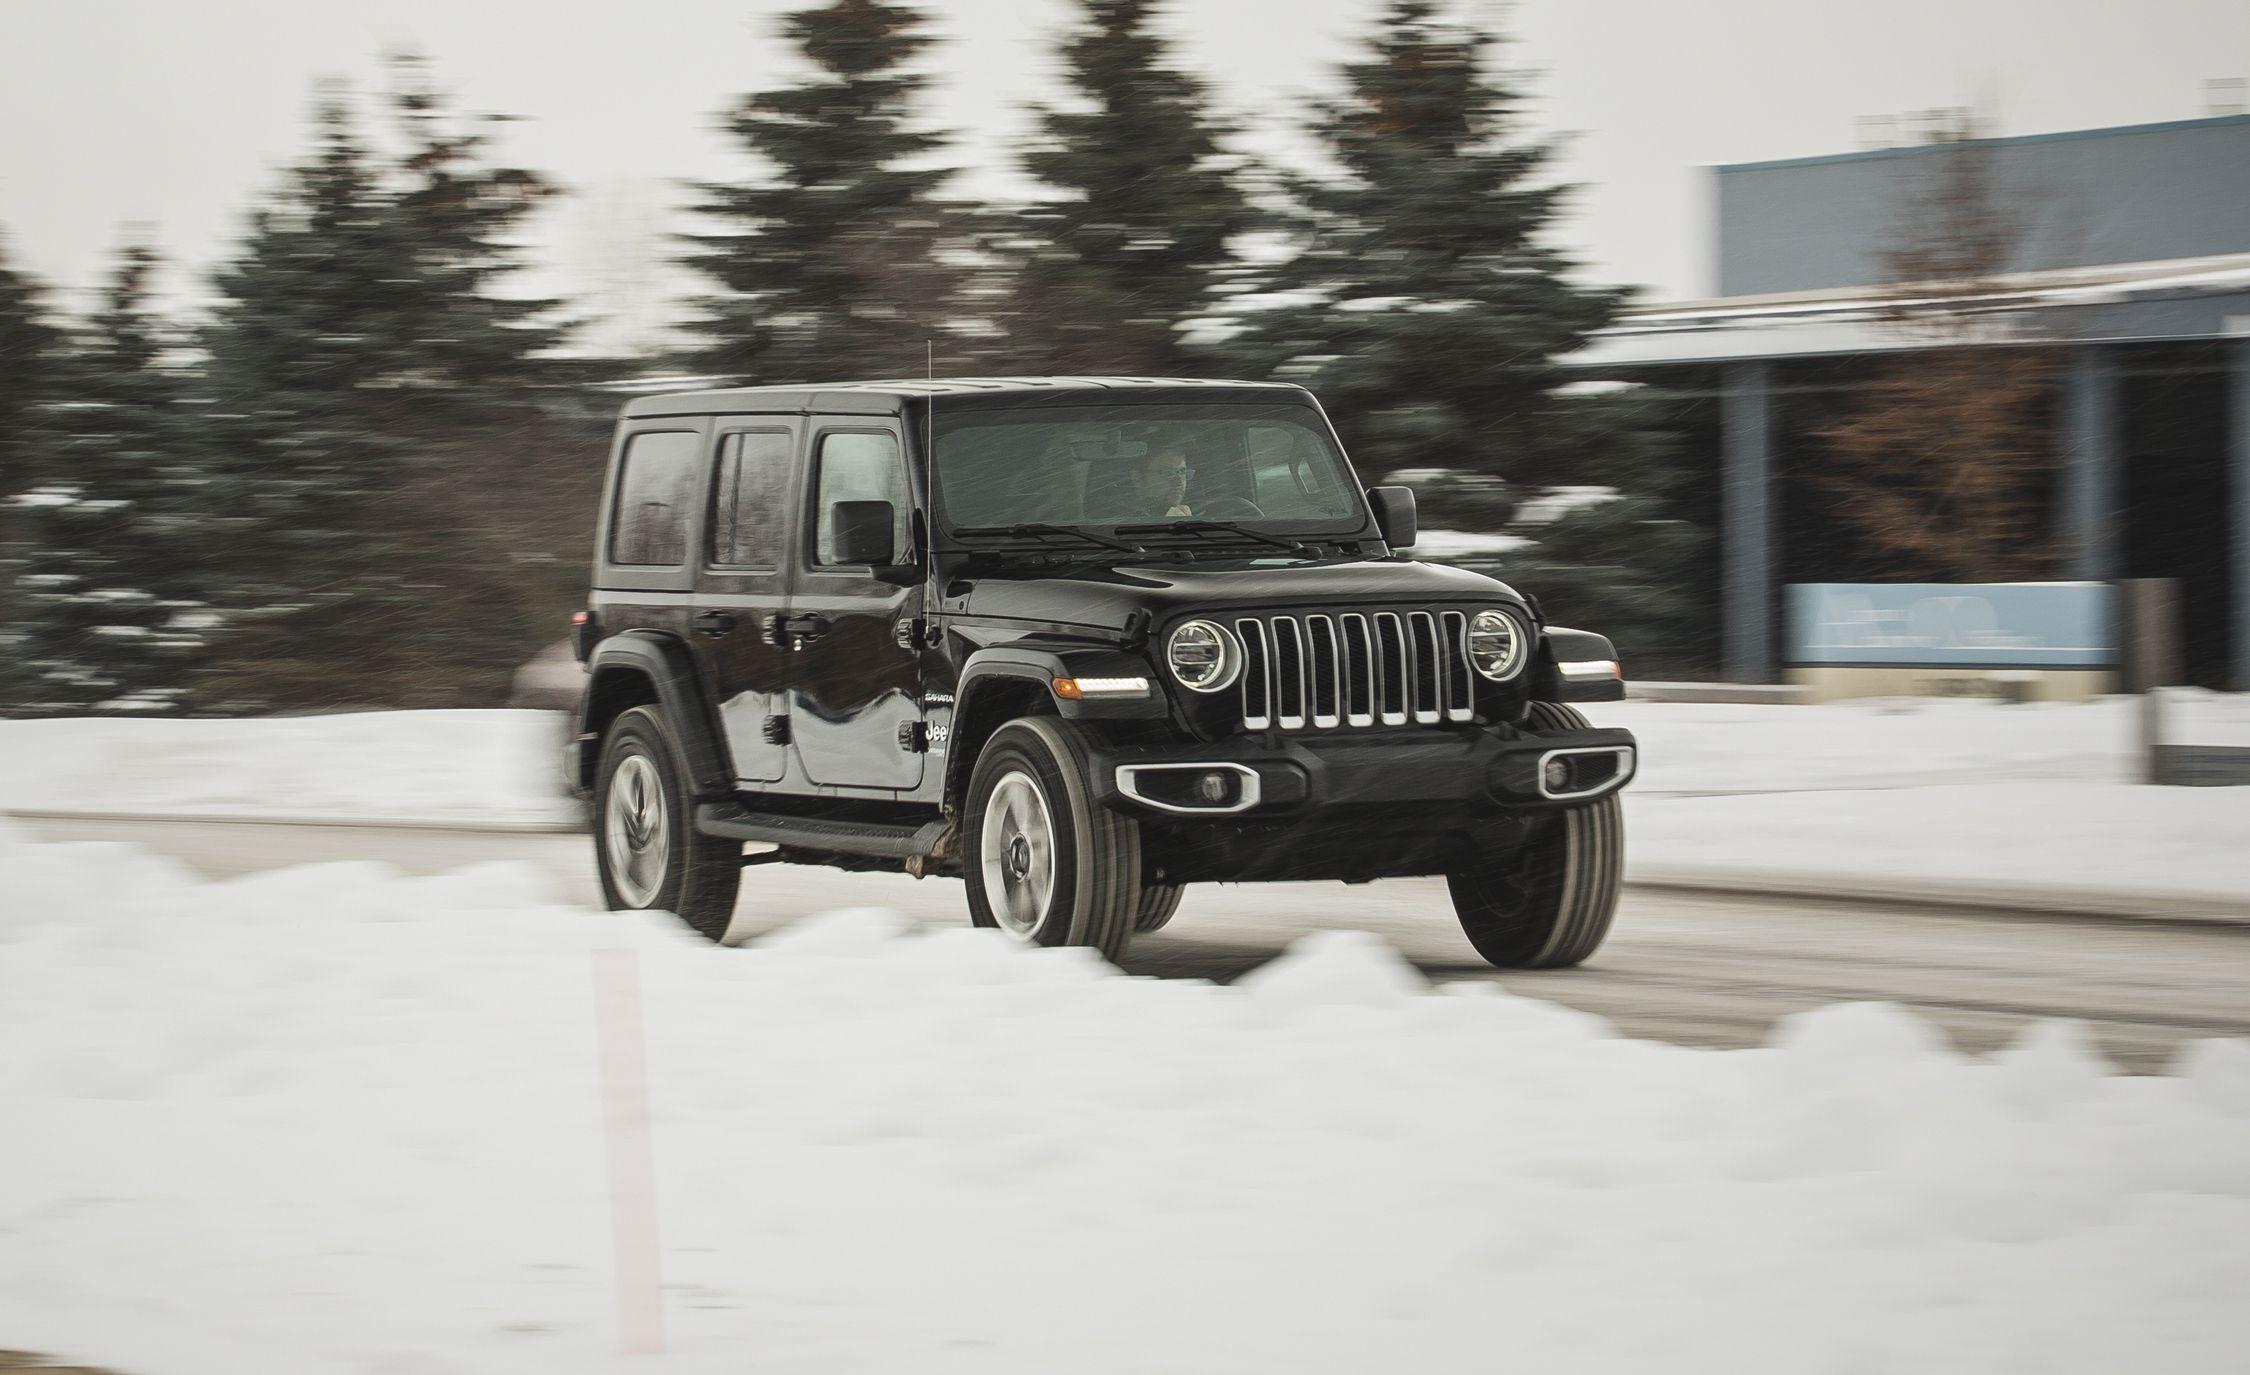 Jeep Wrangler Rubicon Rear Drive Shaft